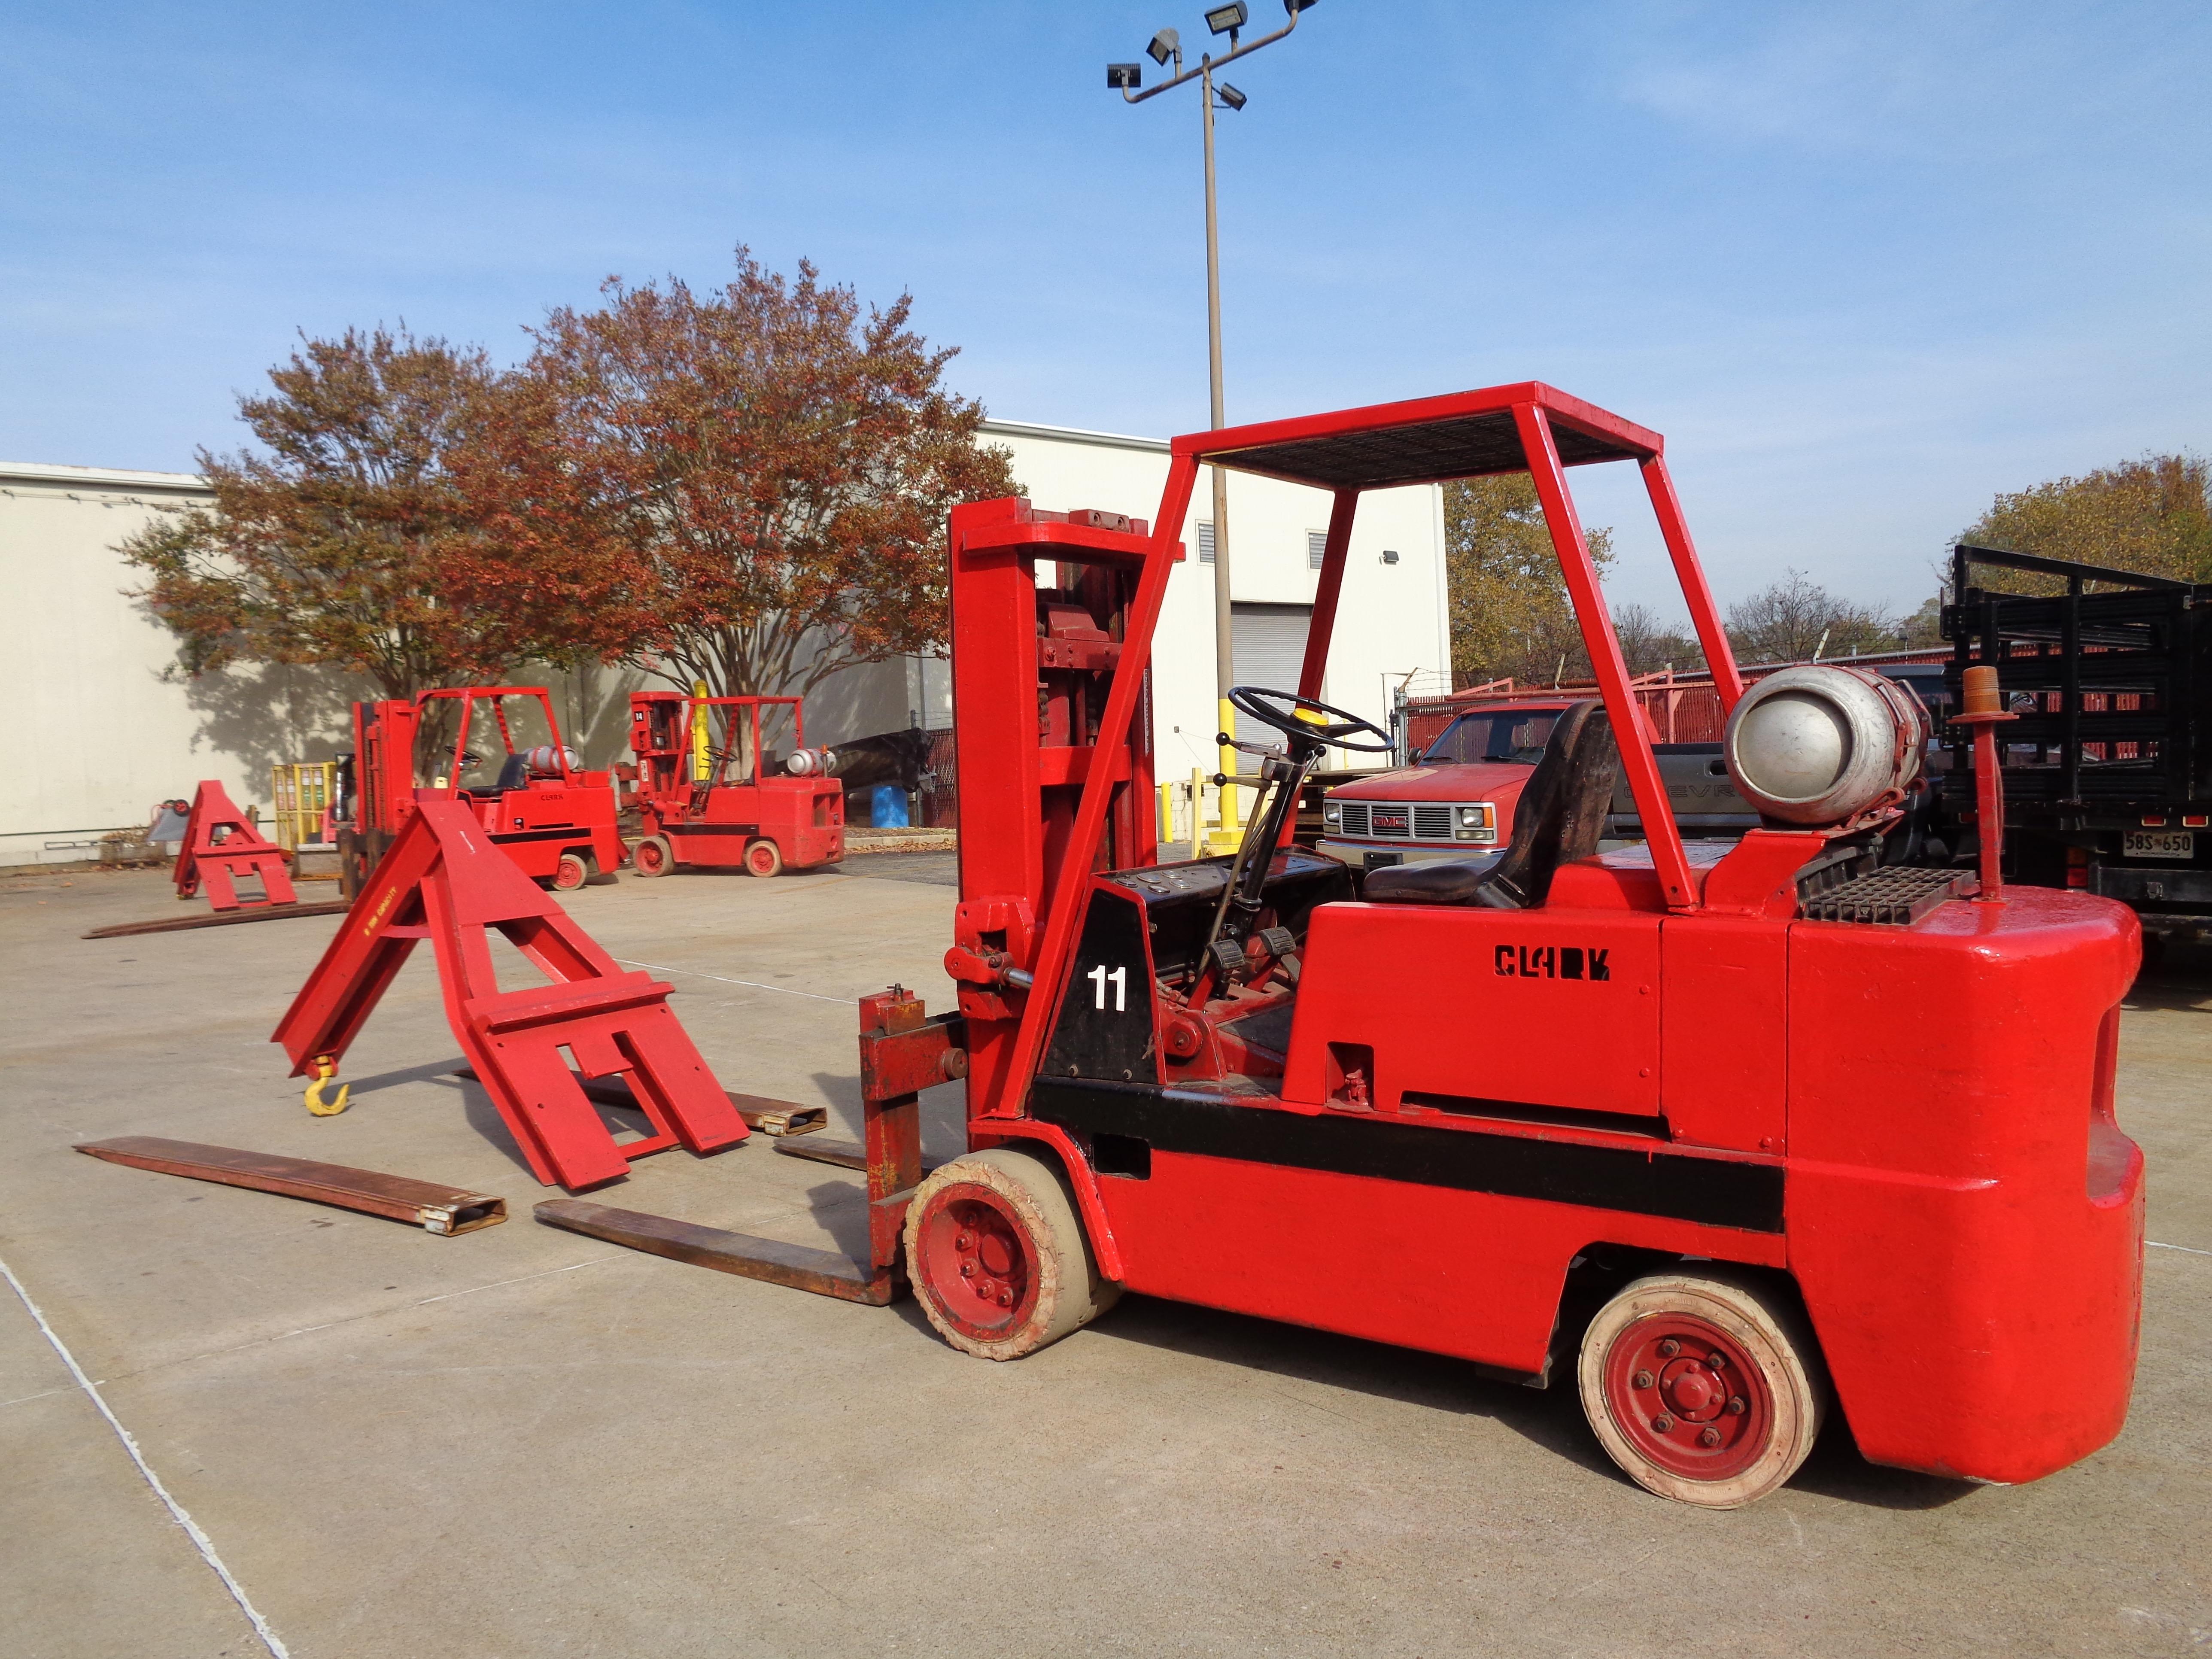 Clark C500-120 Forklift plus boom - 12,000 lbs - Image 2 of 11